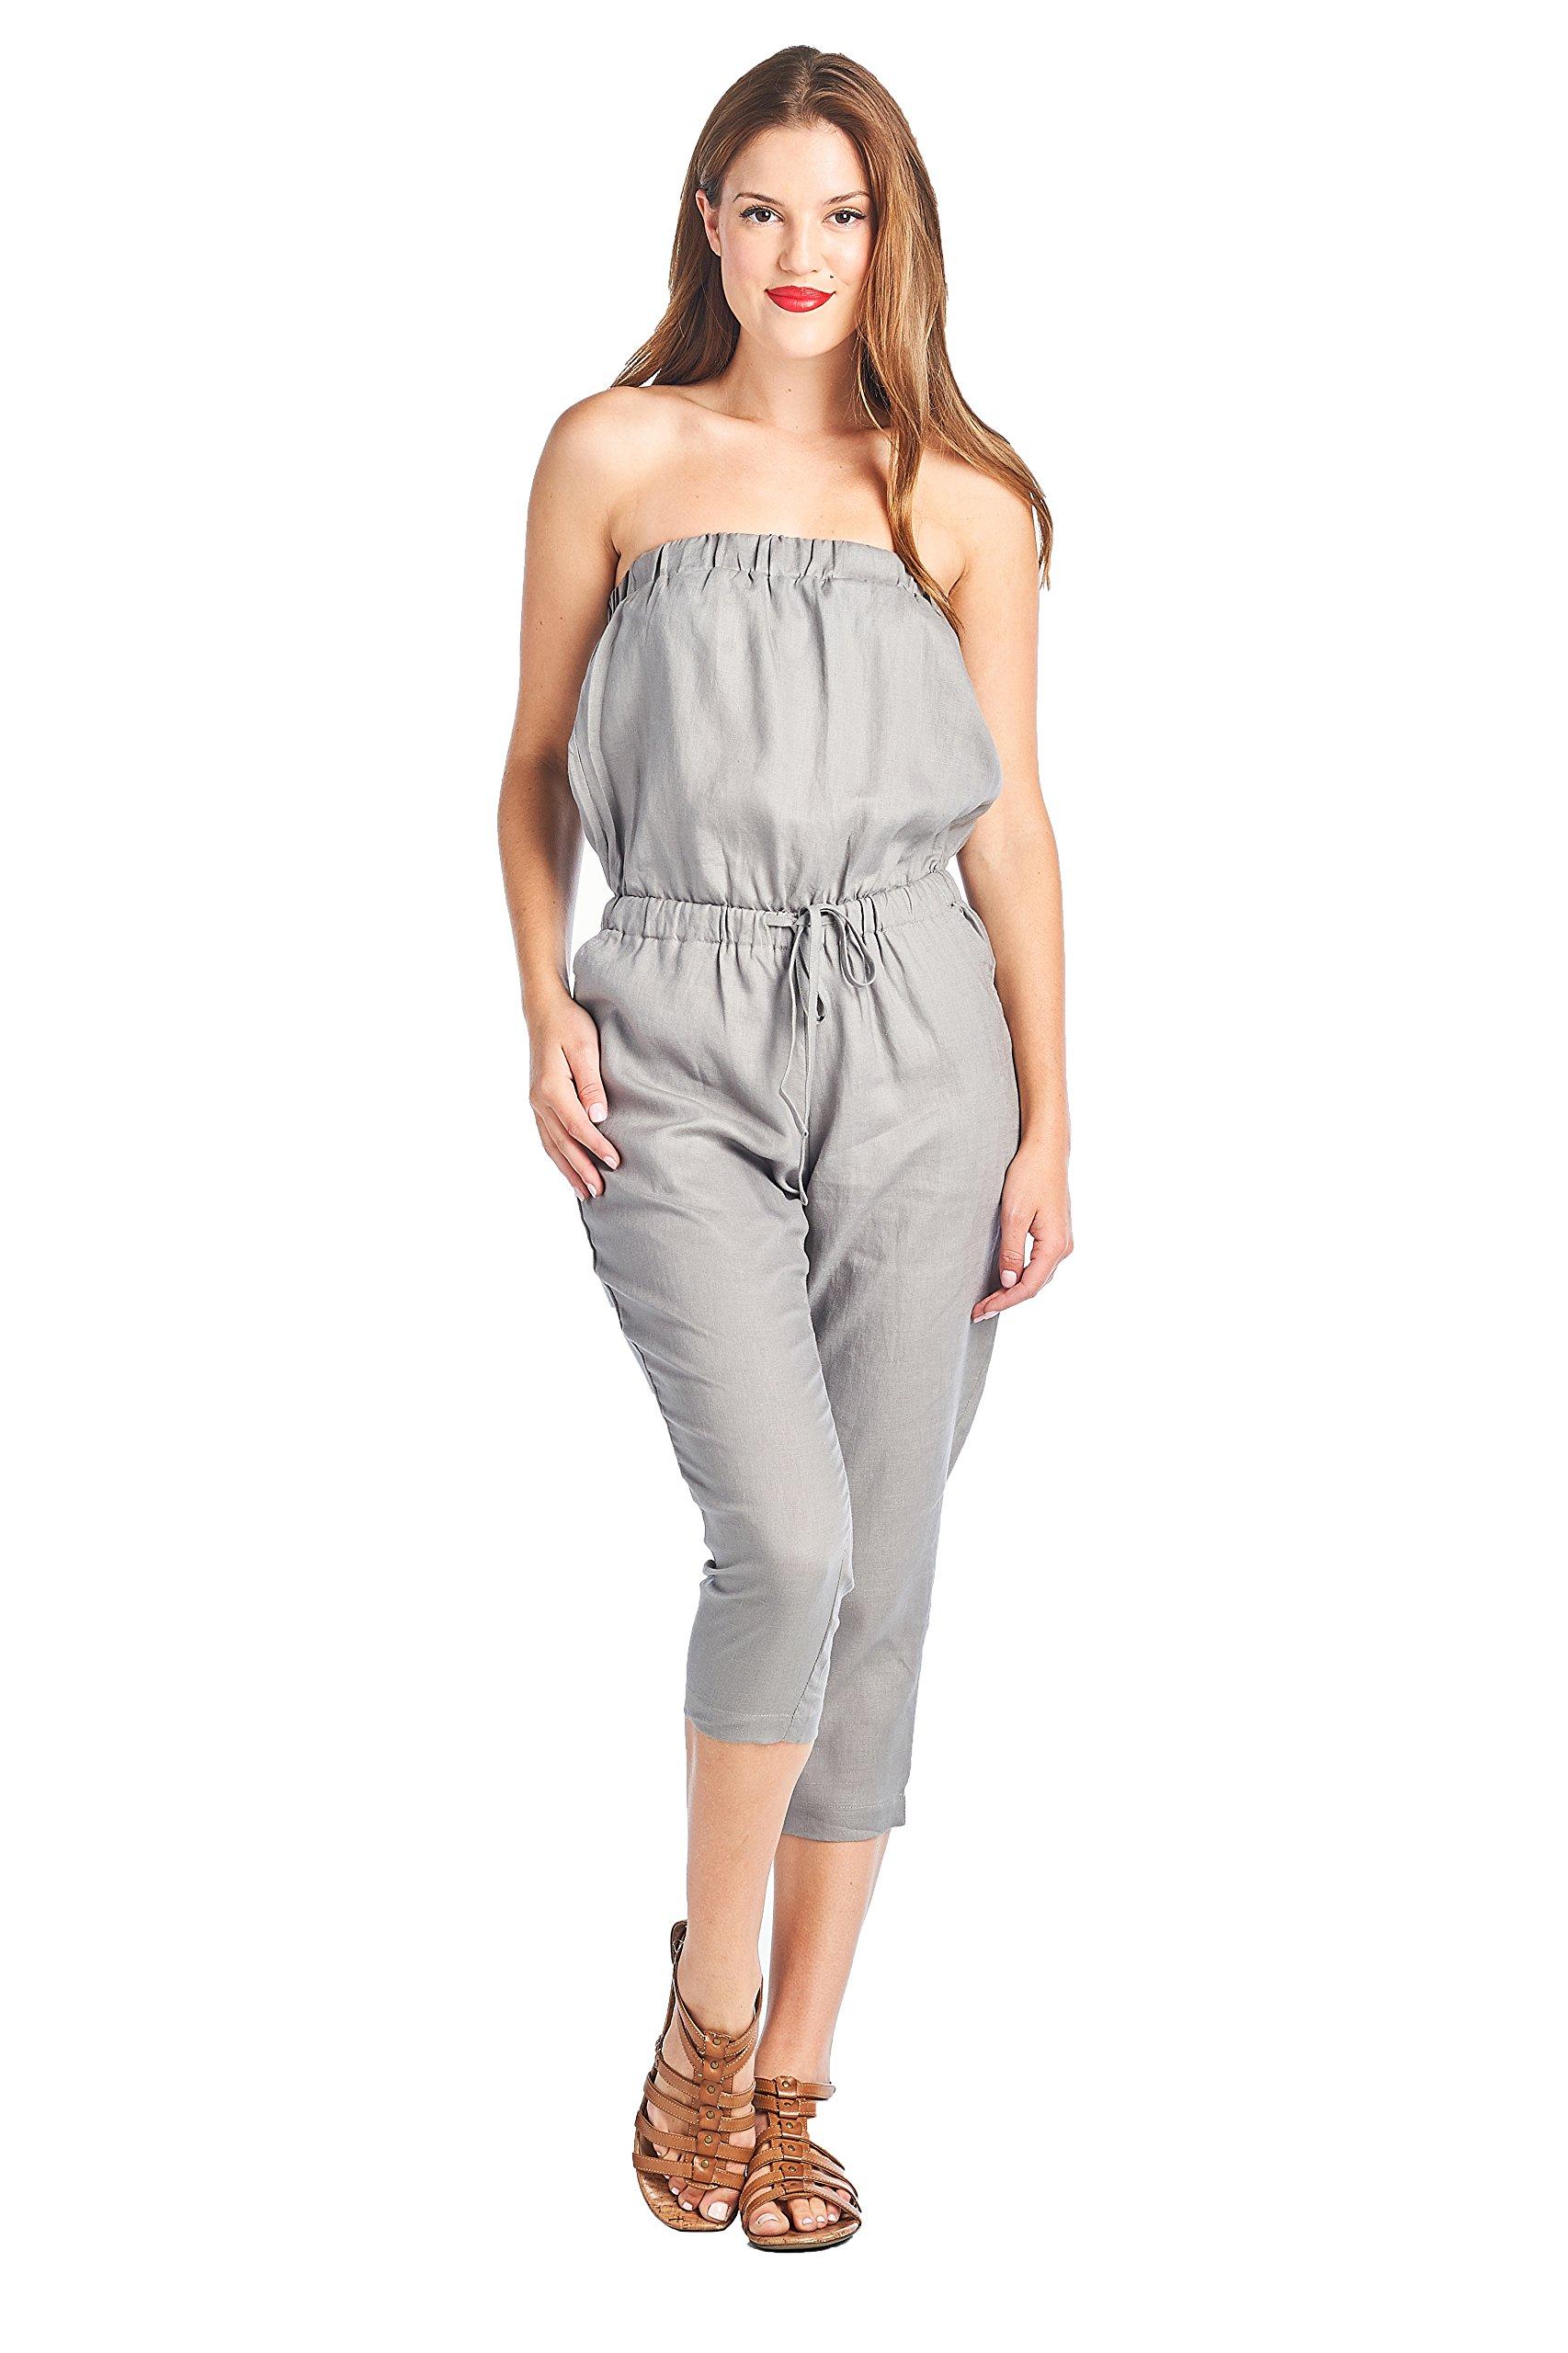 High Style Women's Strapless Capri length 100% Linen Jumpsuit (1410, CharcoalGray, S)